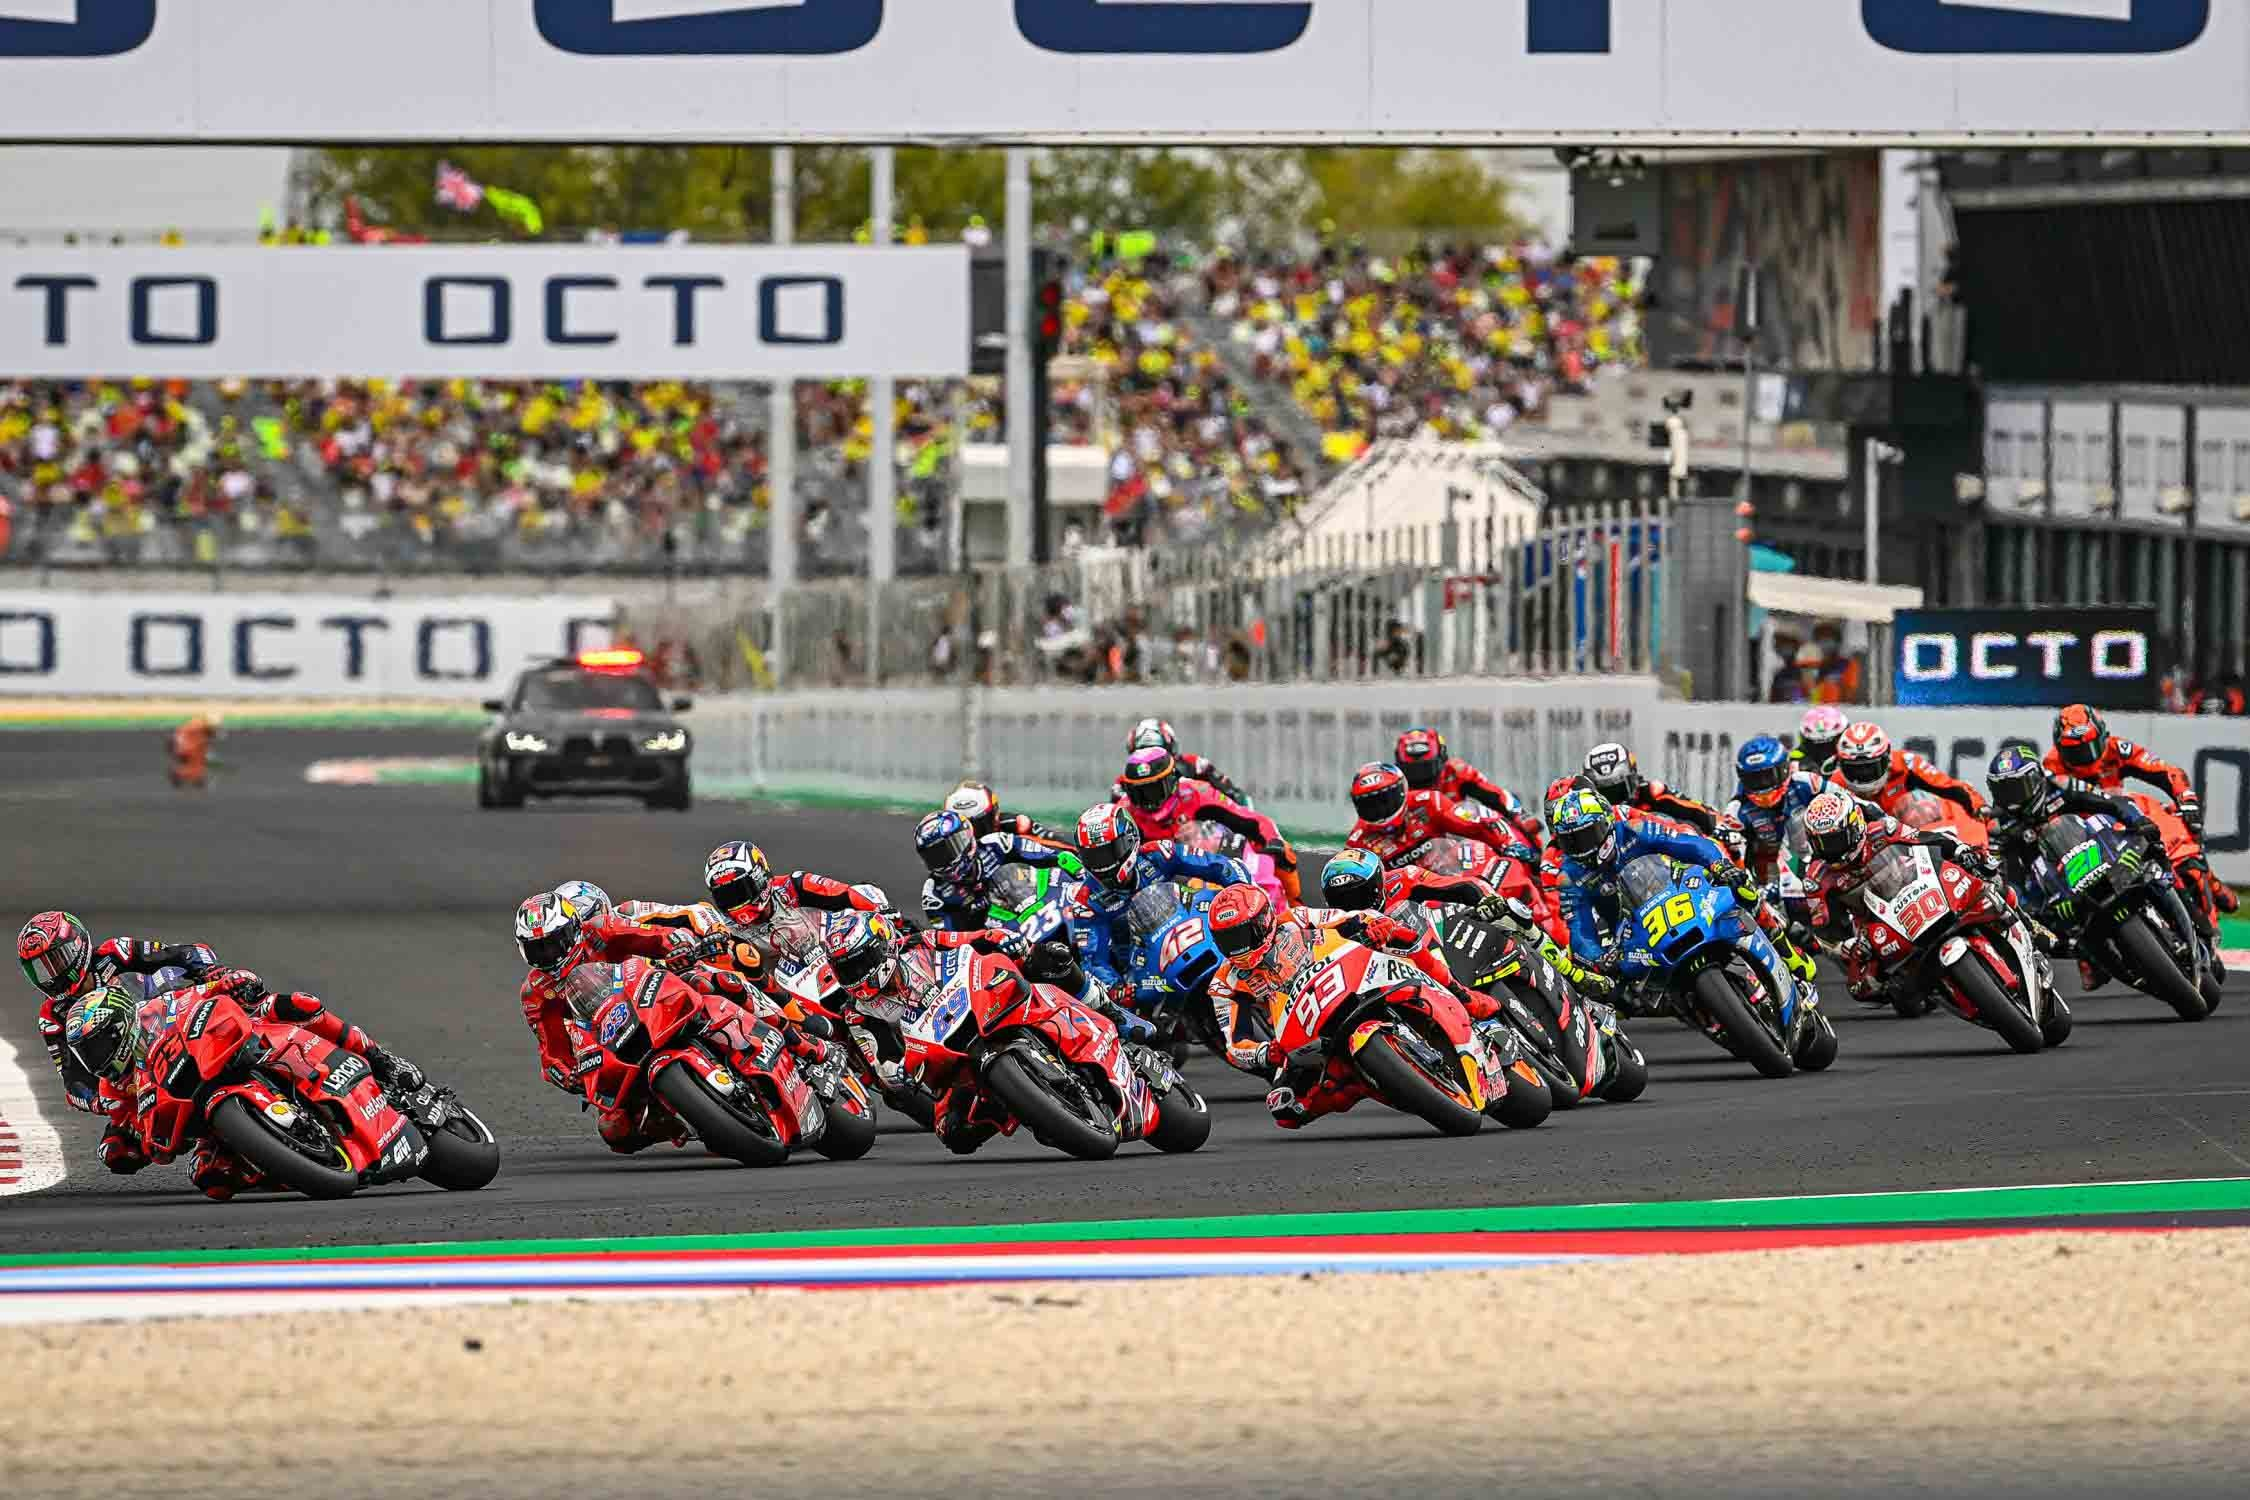 Indonesia Resmi Masuk Kalendar MotoGP!